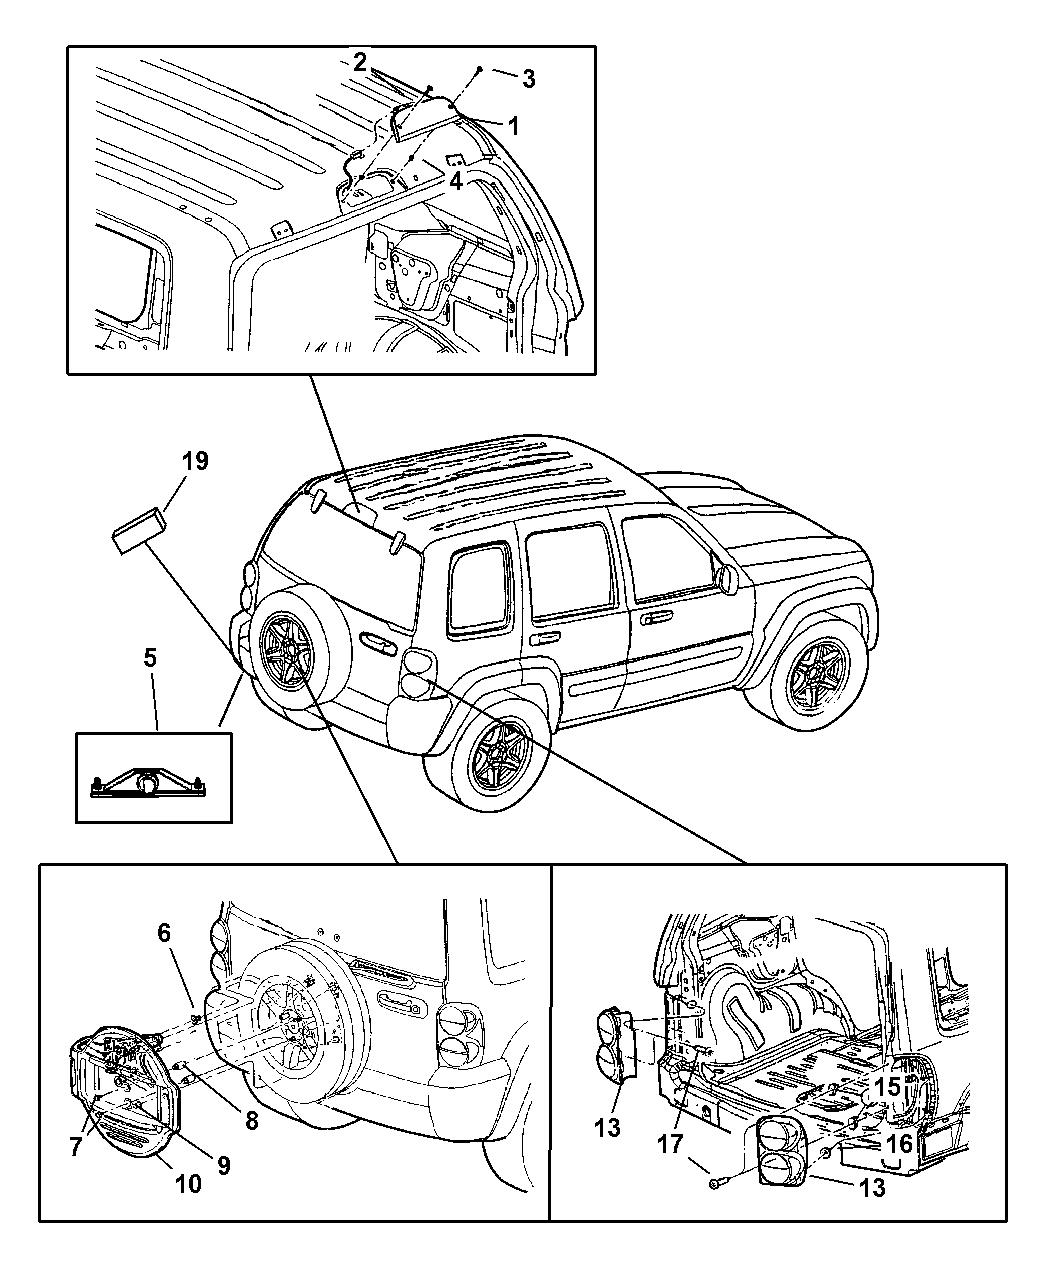 56010329ad